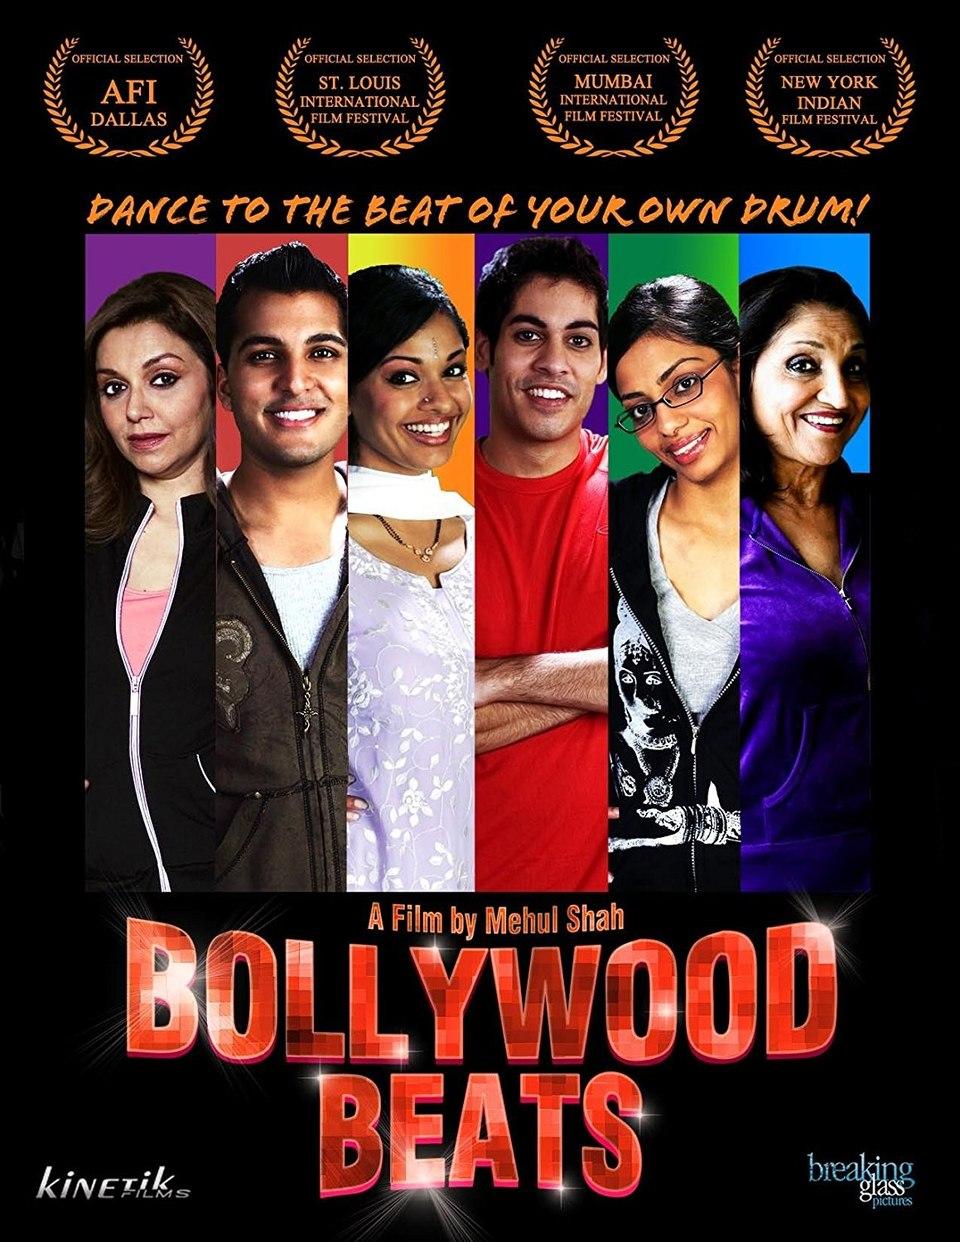 Film Bollywoodské rytmy